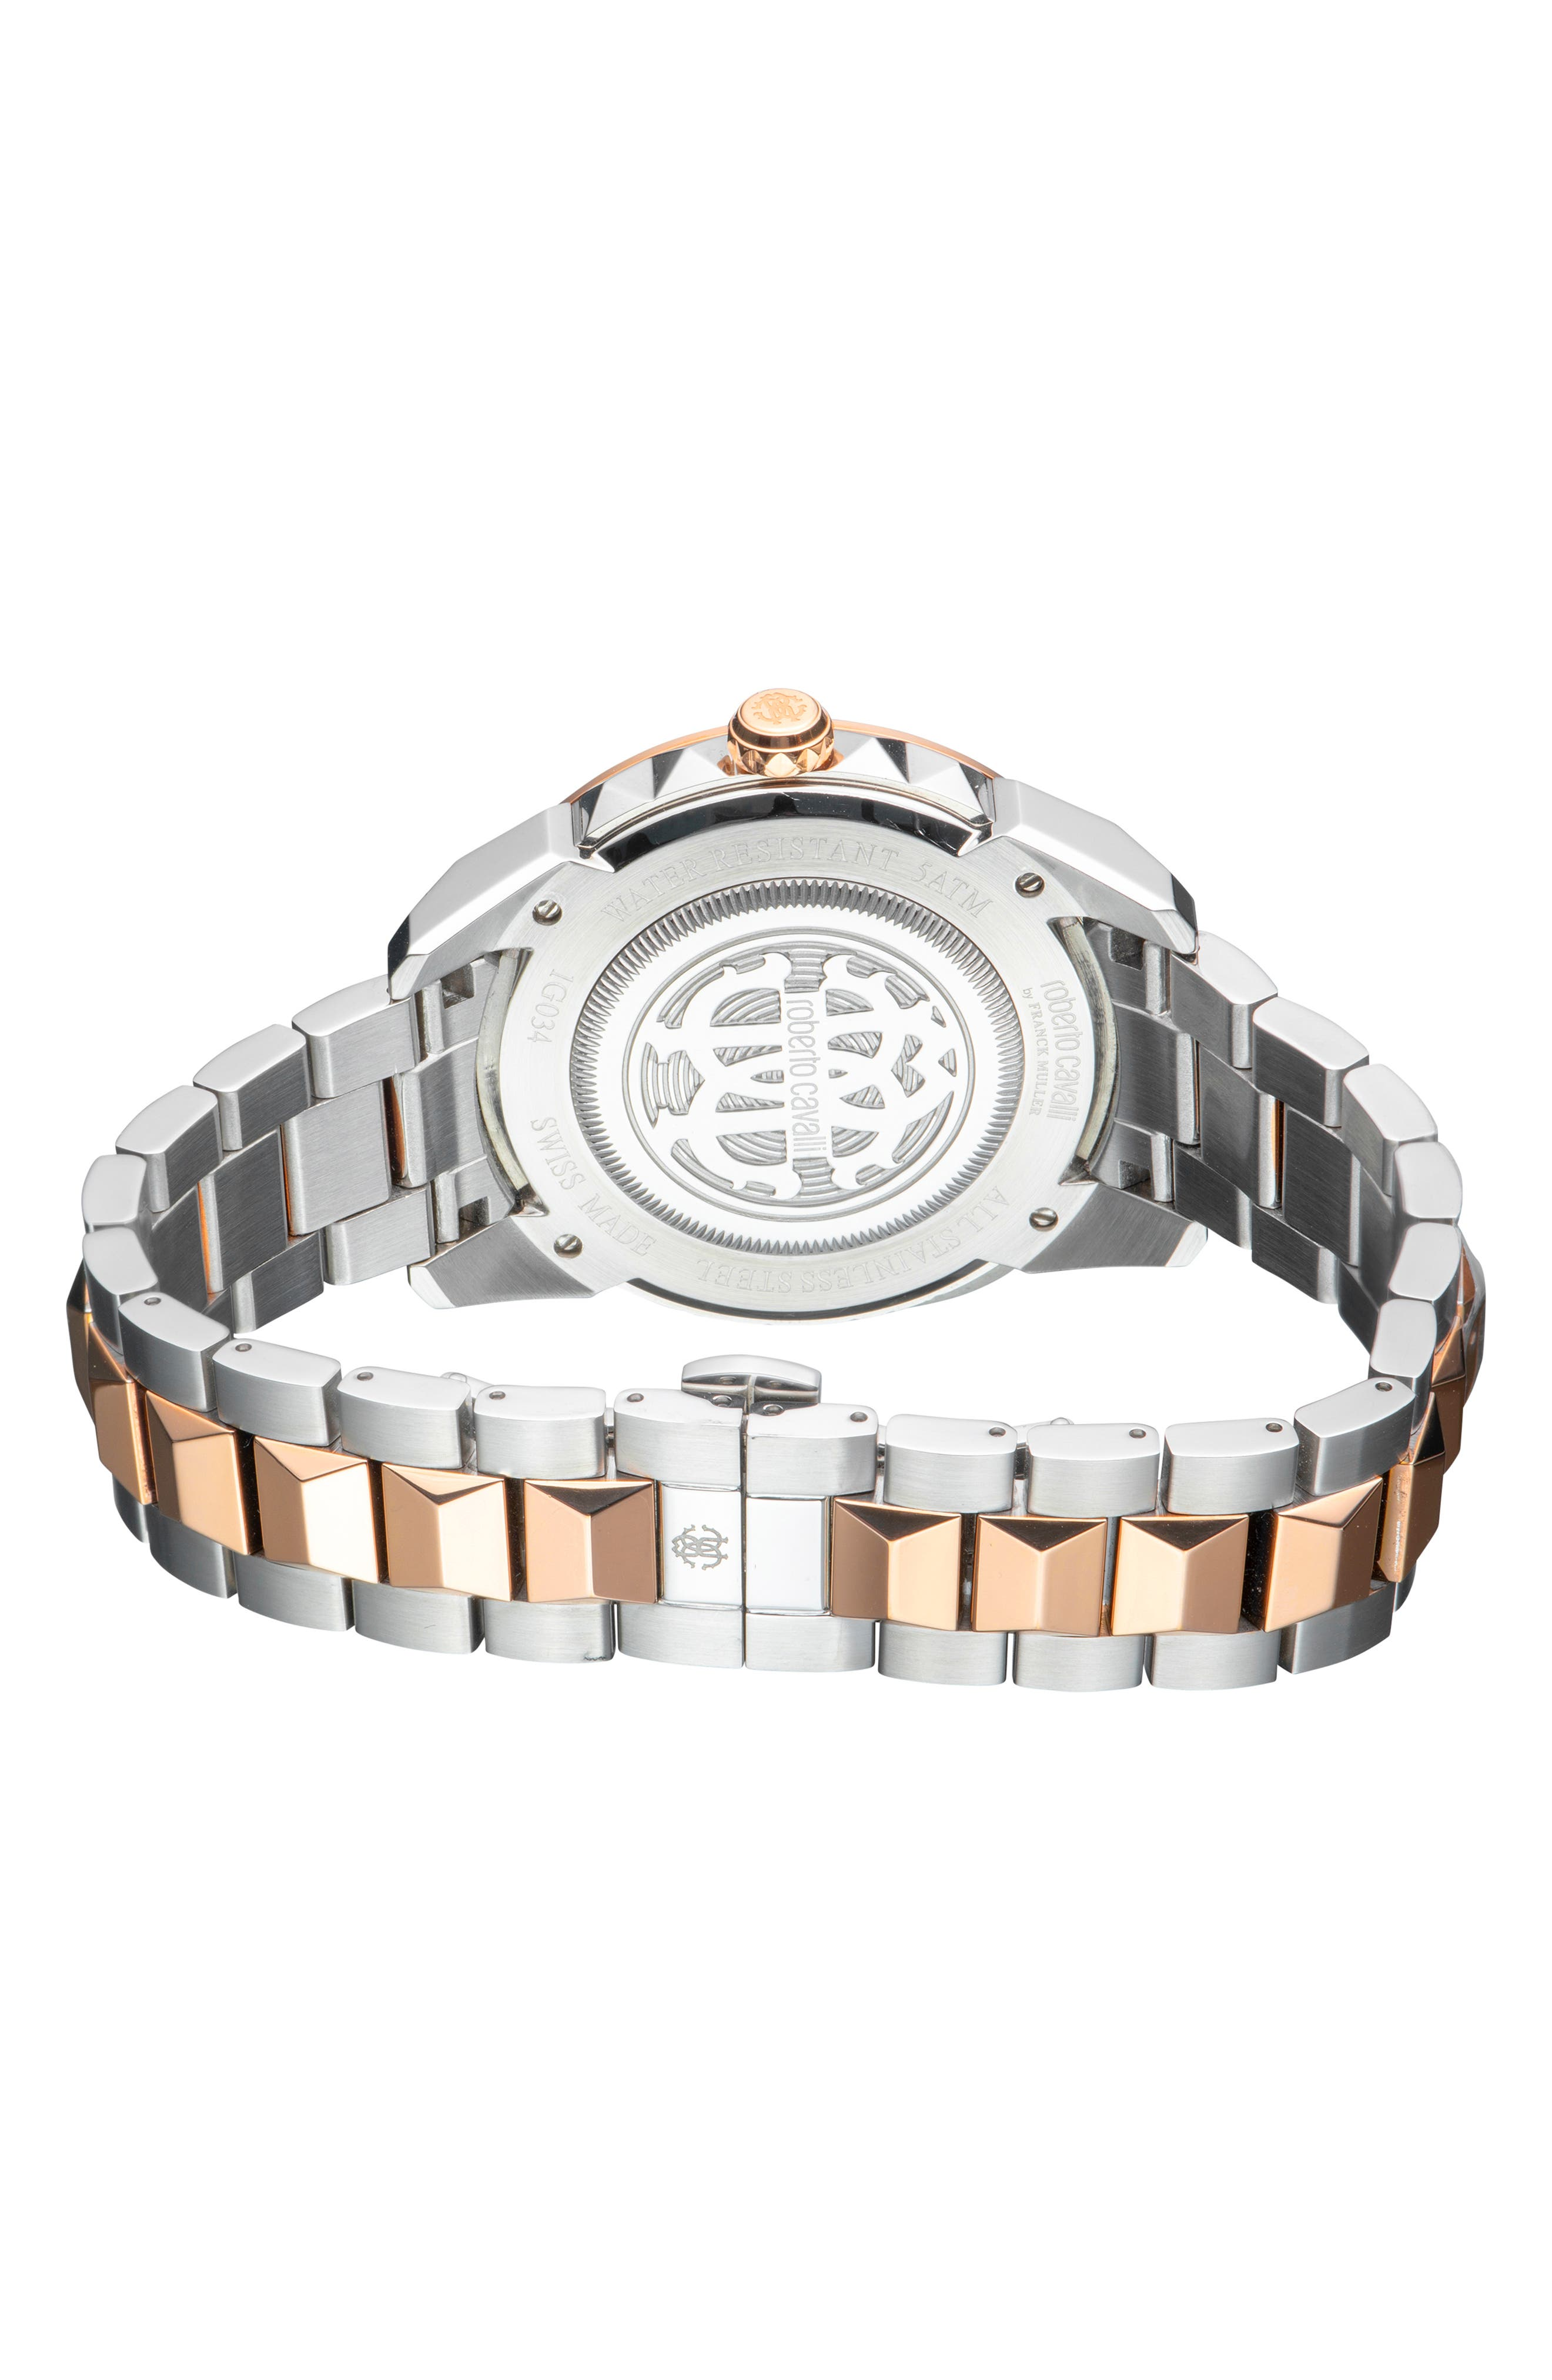 Costellato Bracelet Watch,                             Alternate thumbnail 2, color,                             ROSE GOLD/ SILVER